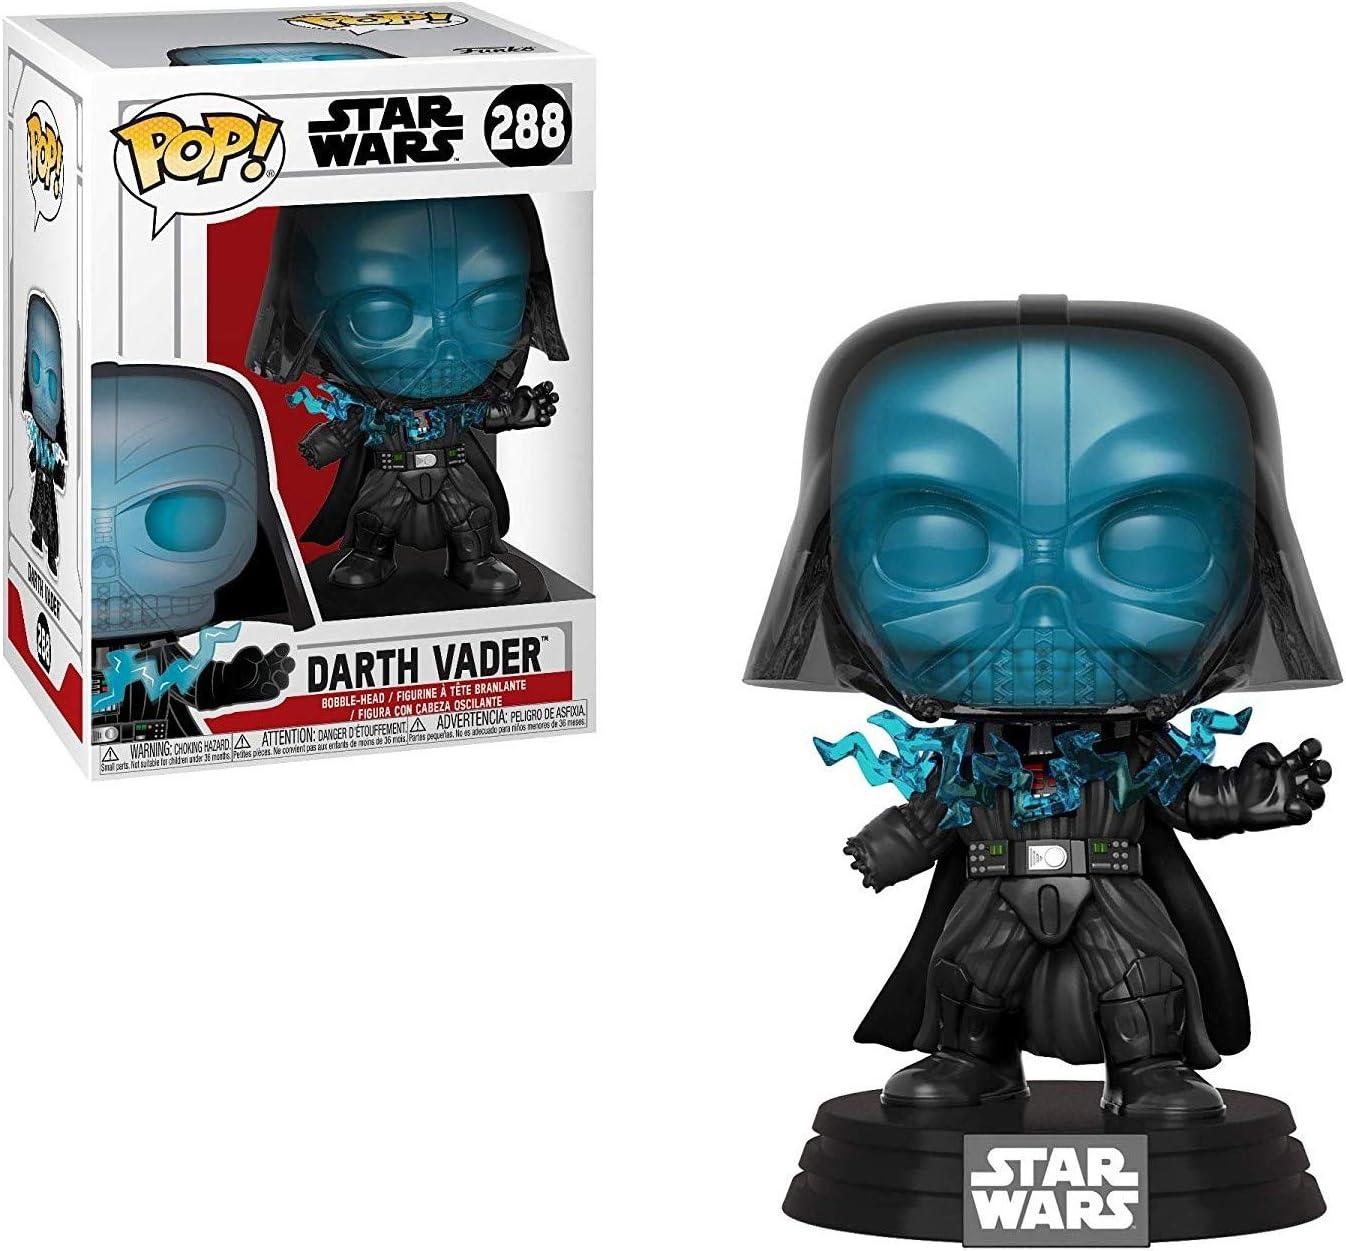 Star Wars: Return of The Jedi Vinyl Bobble-Head Figure Electrocuted Darth Vader Funko Pop Includes Compatible Pop Box Protector Case